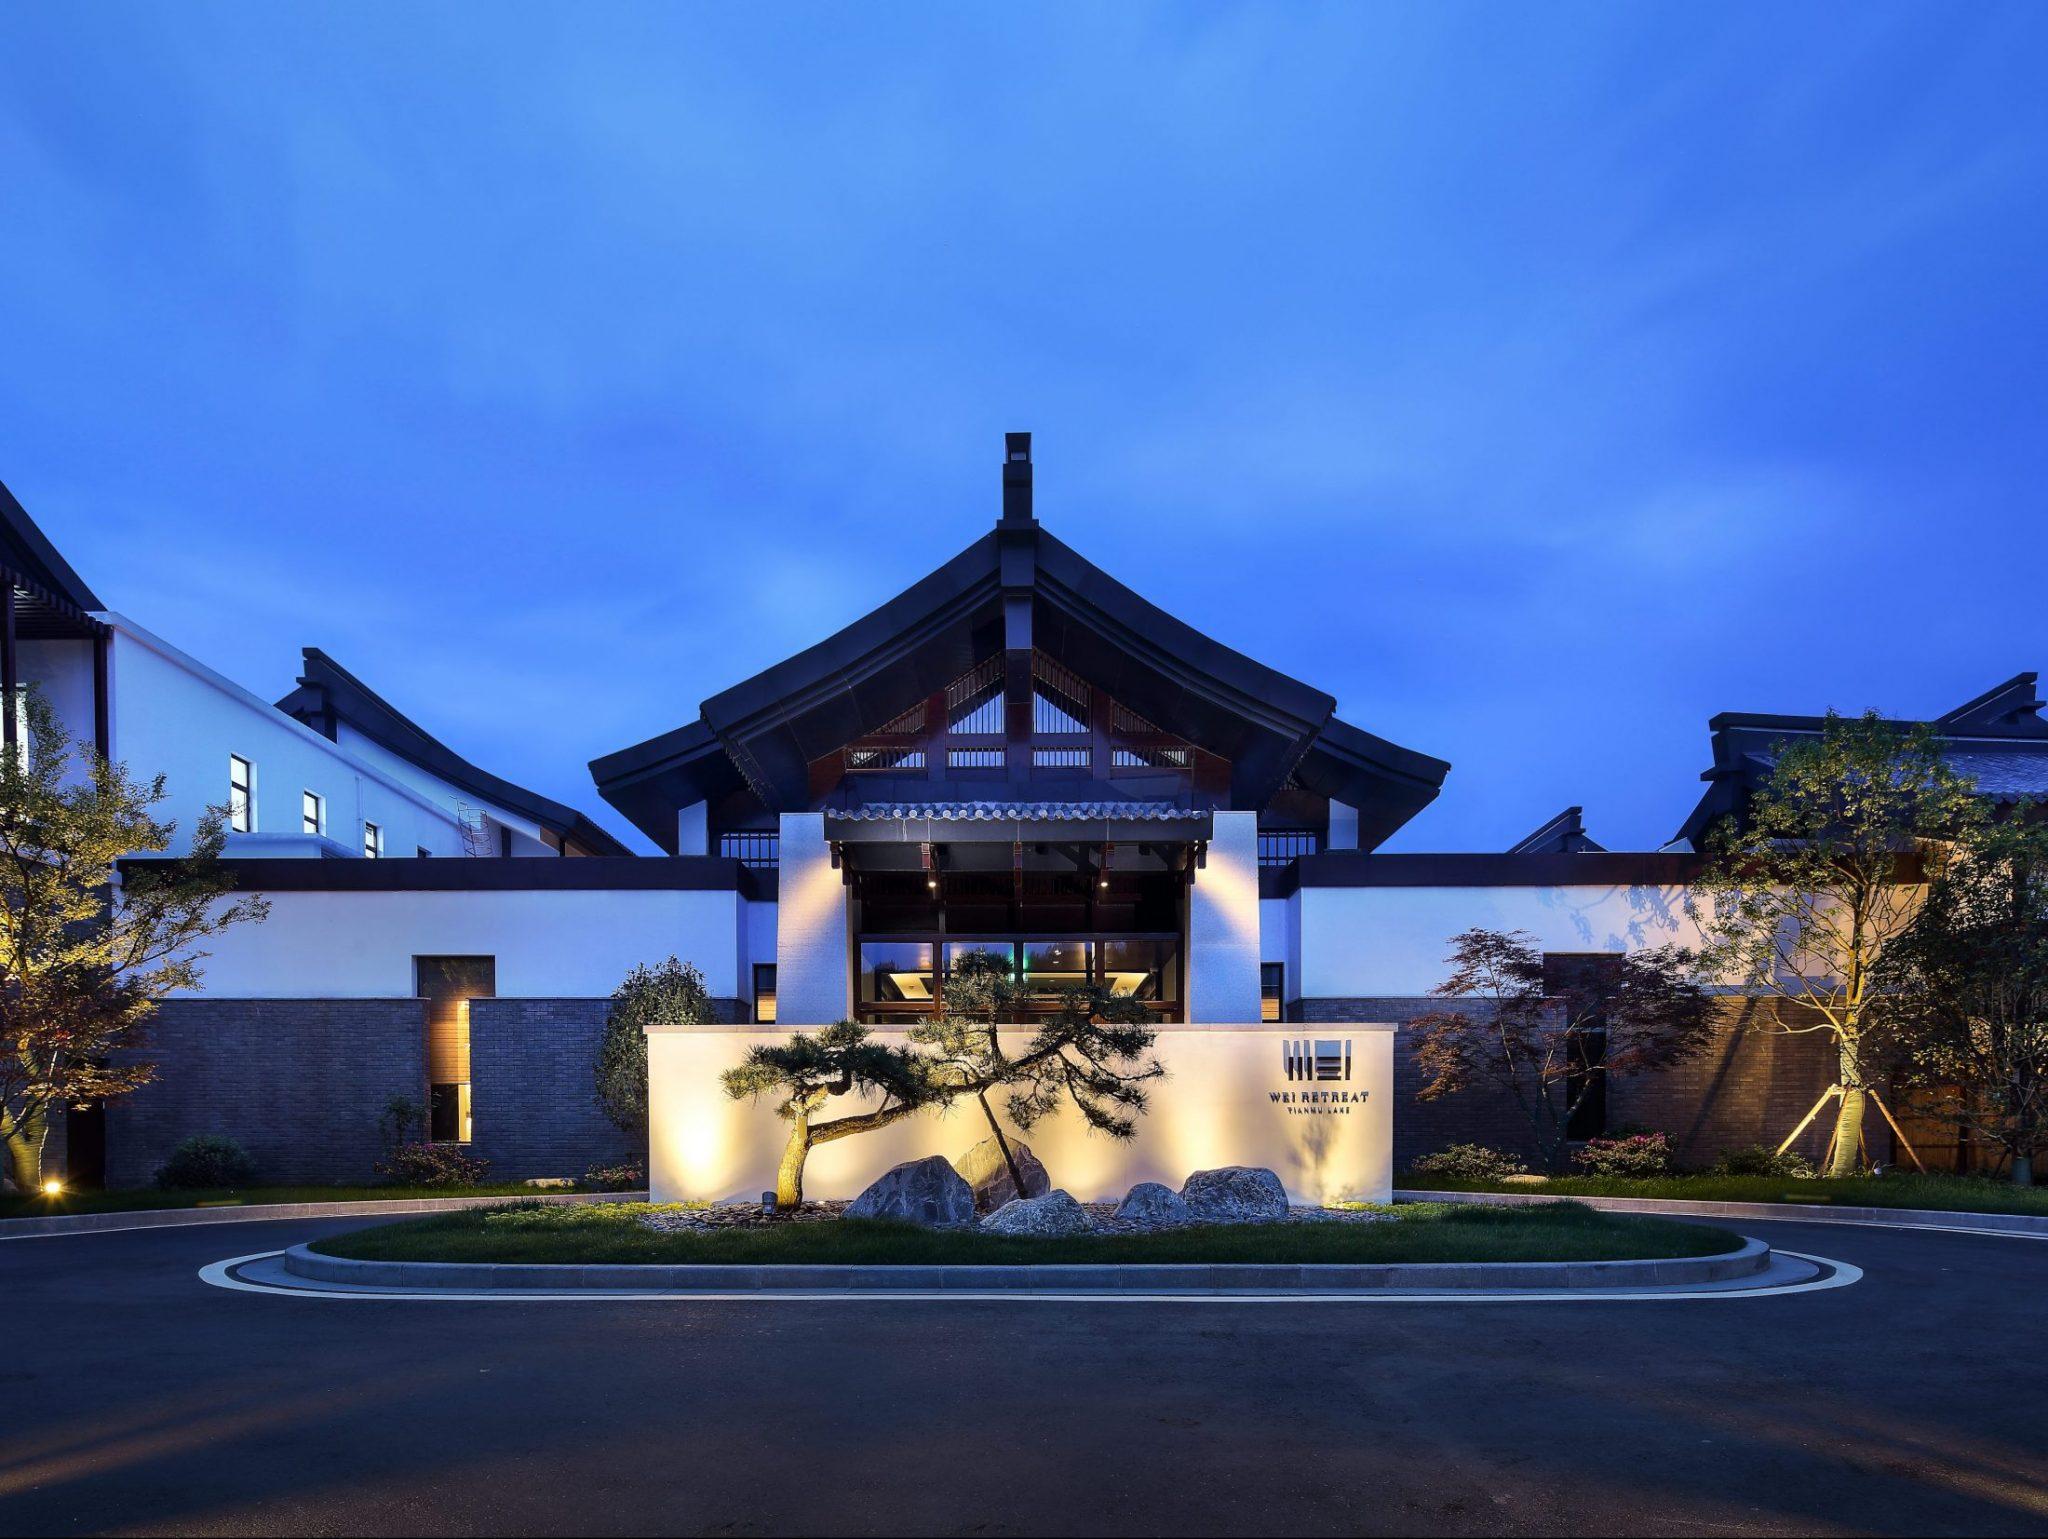 WEI Retreat Tianmu Lake Resort opened